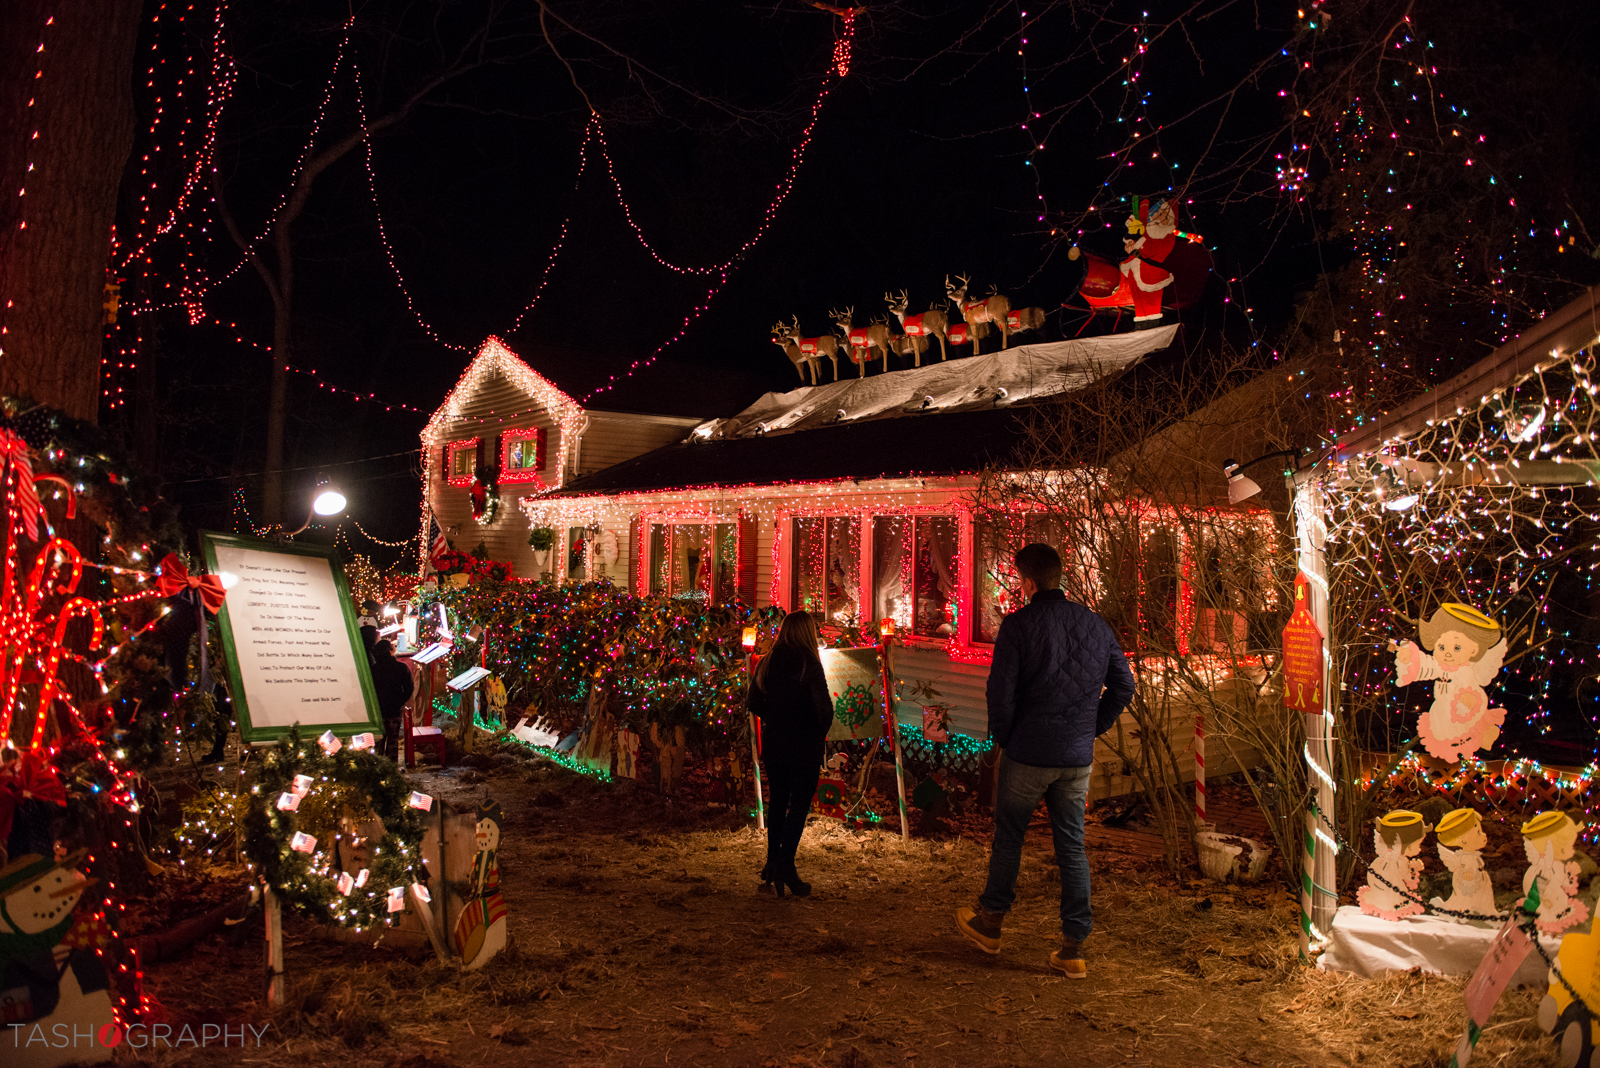 settis-christmas-village-norwalk-ct